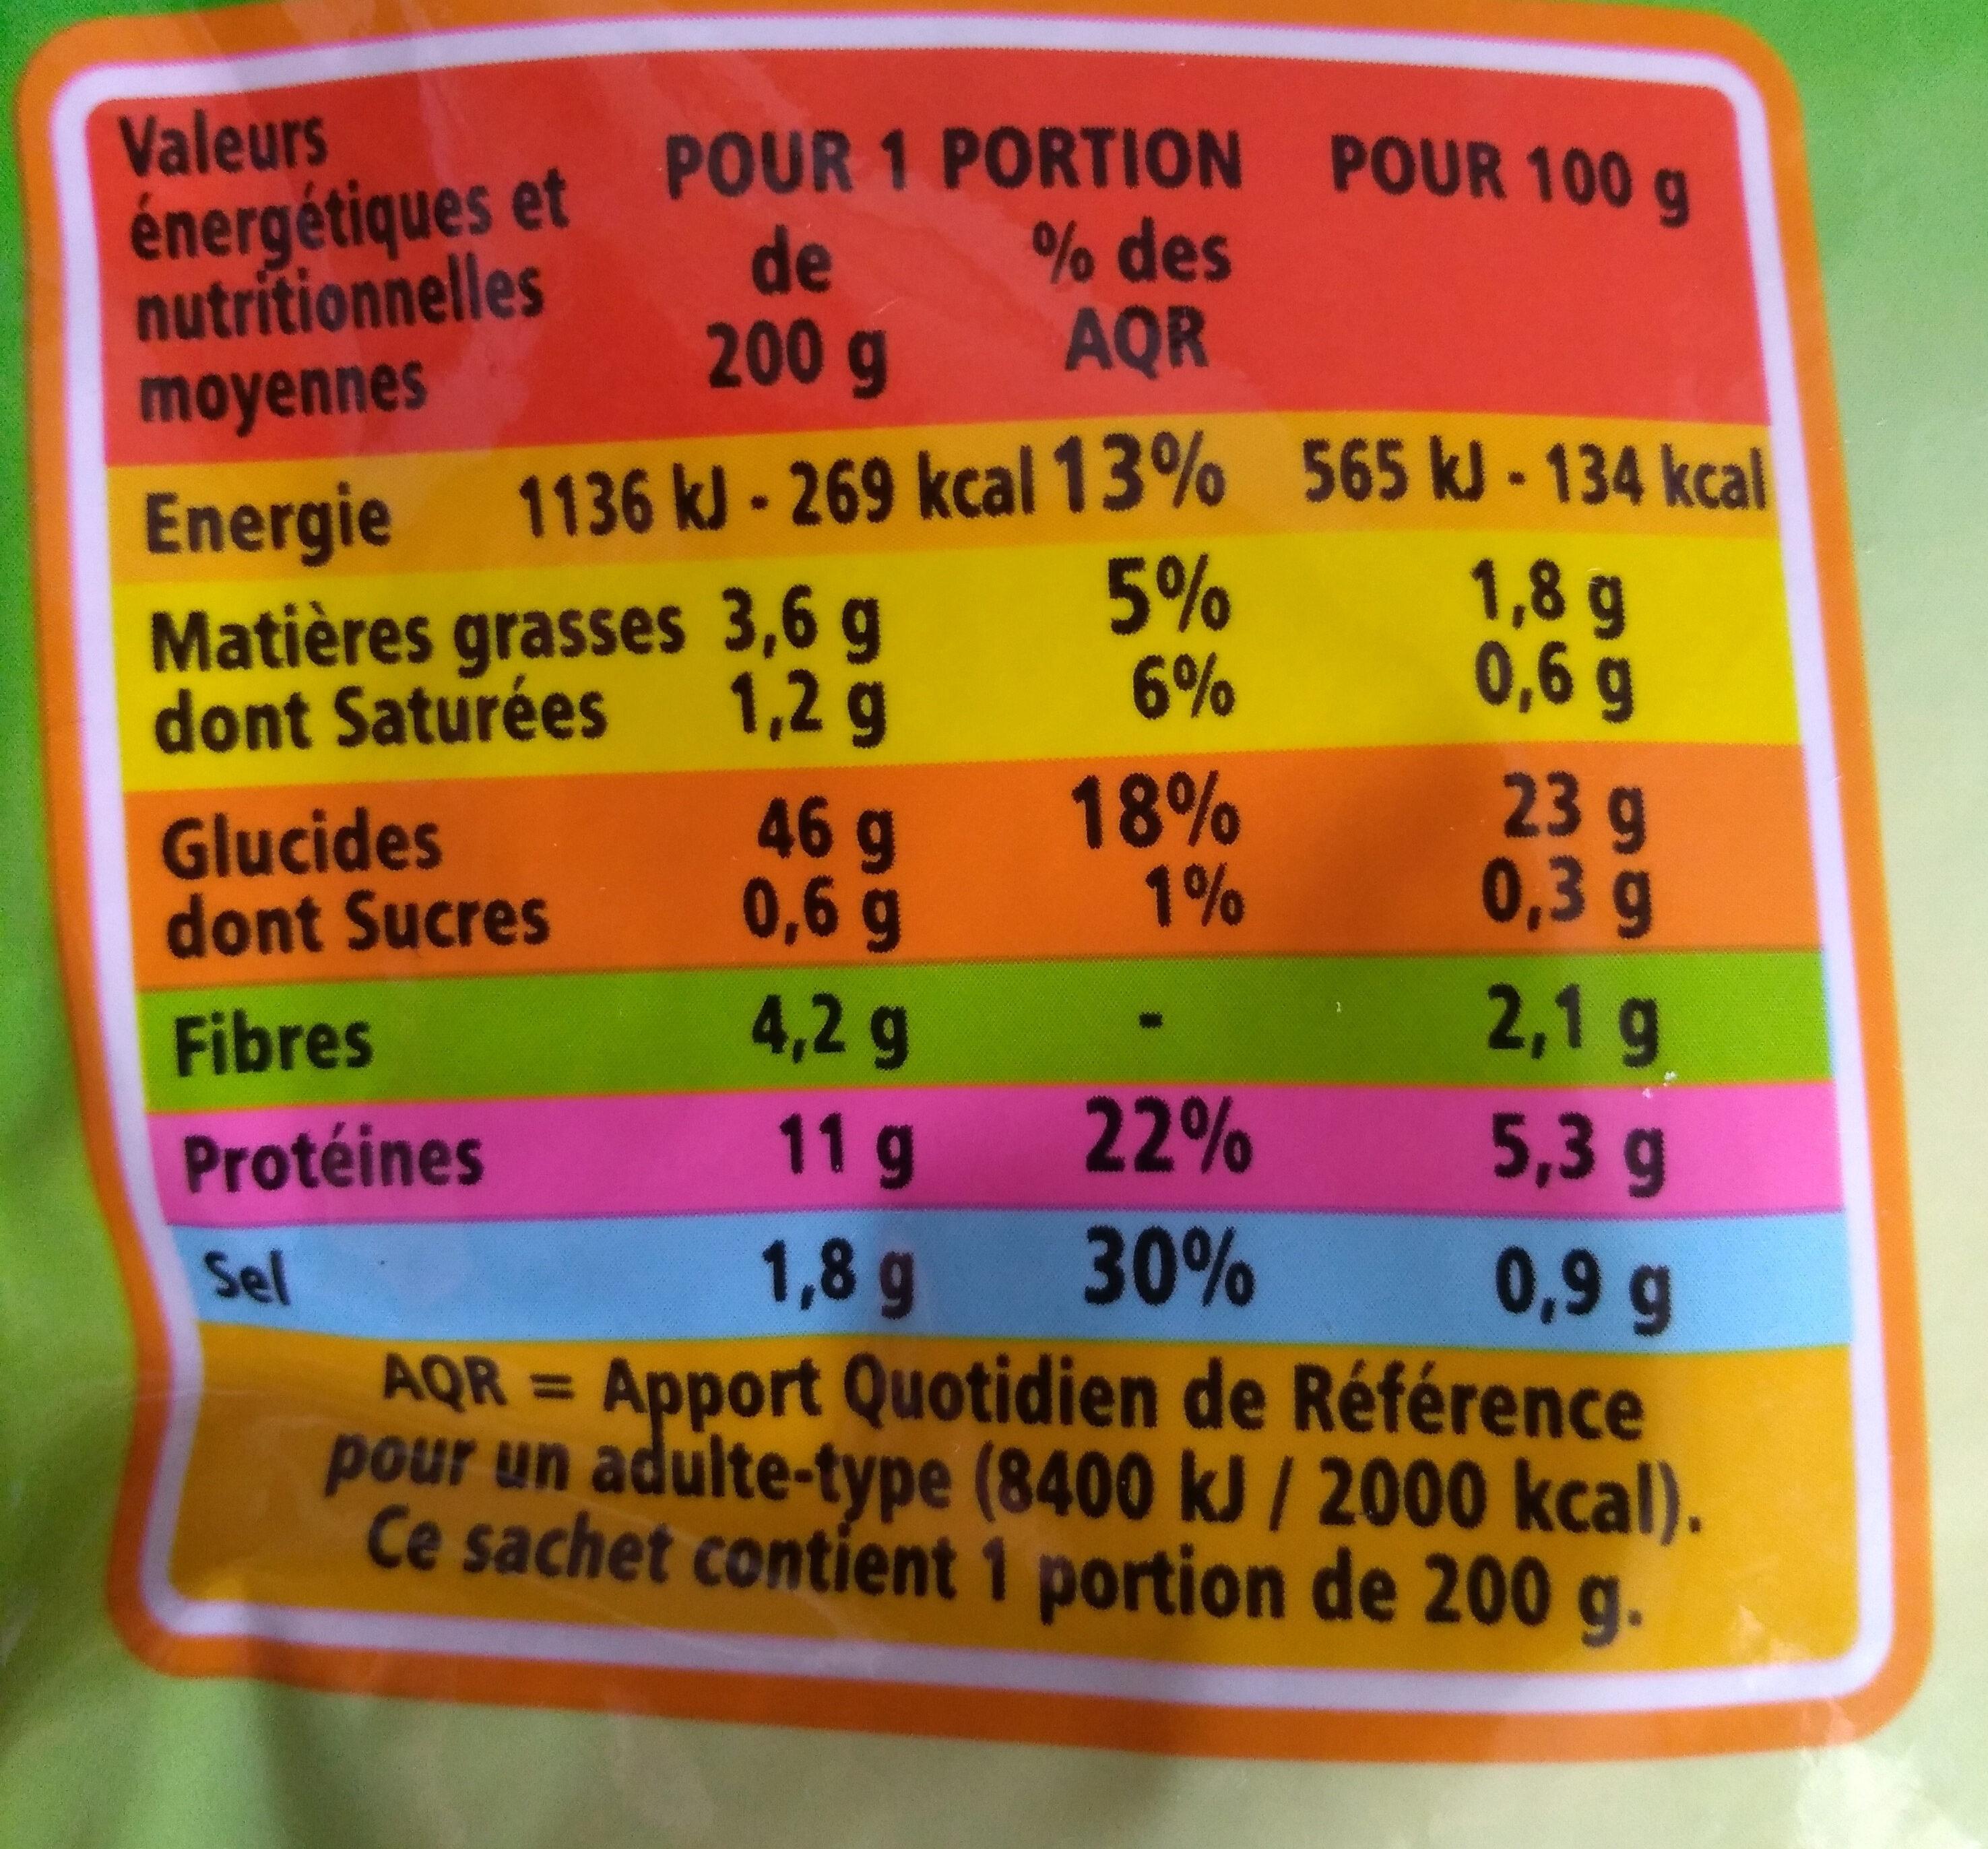 Coquillettes au Beurre - Nutrition facts - fr